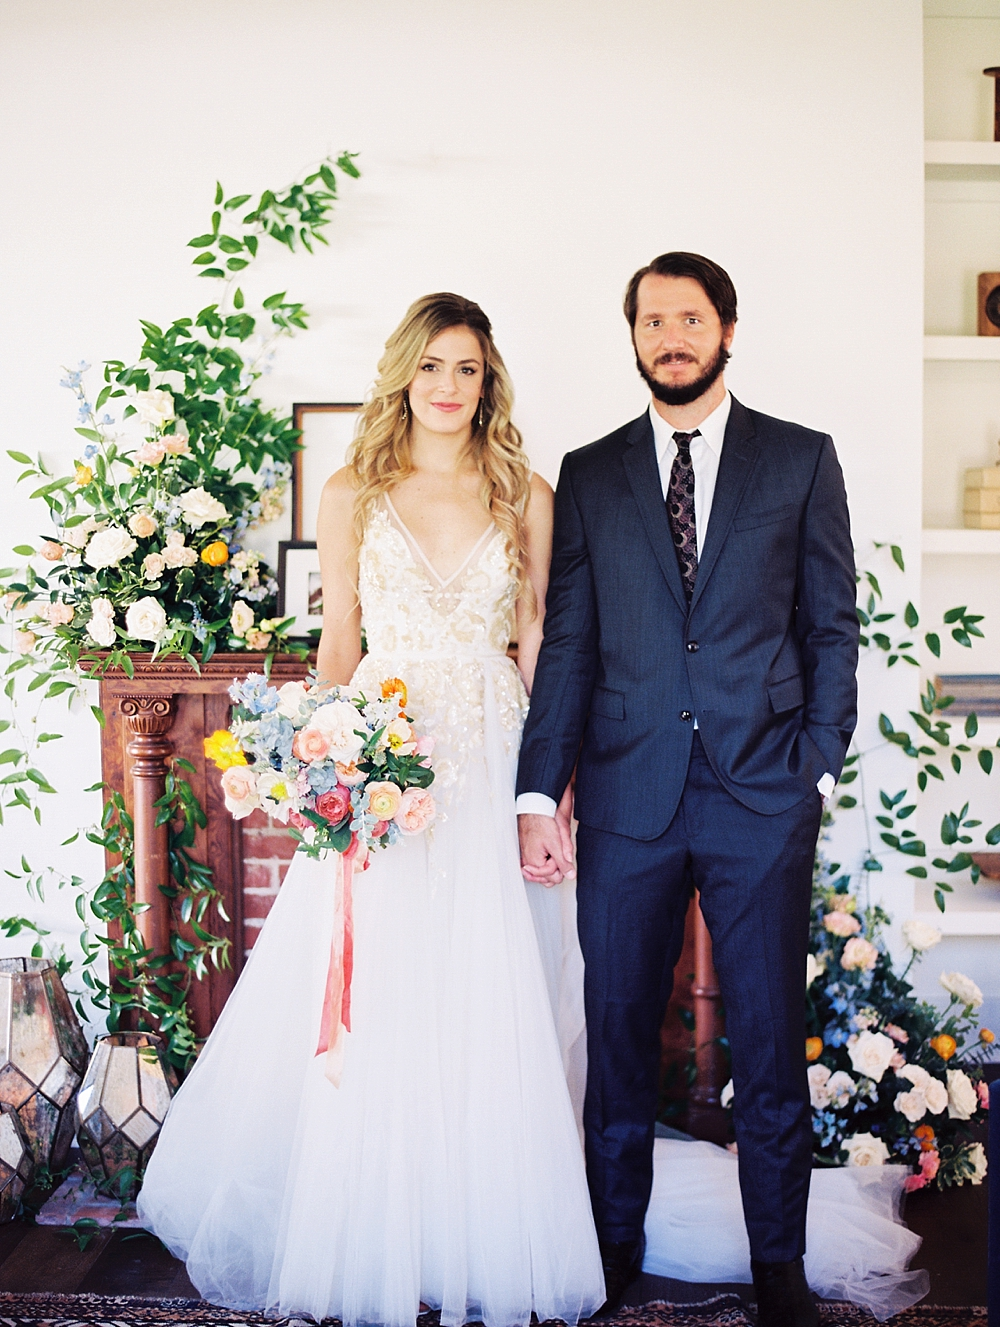 Kristin-La-Voie-Photography-Austin-Wedding-Photographer-the-grand-lady-75